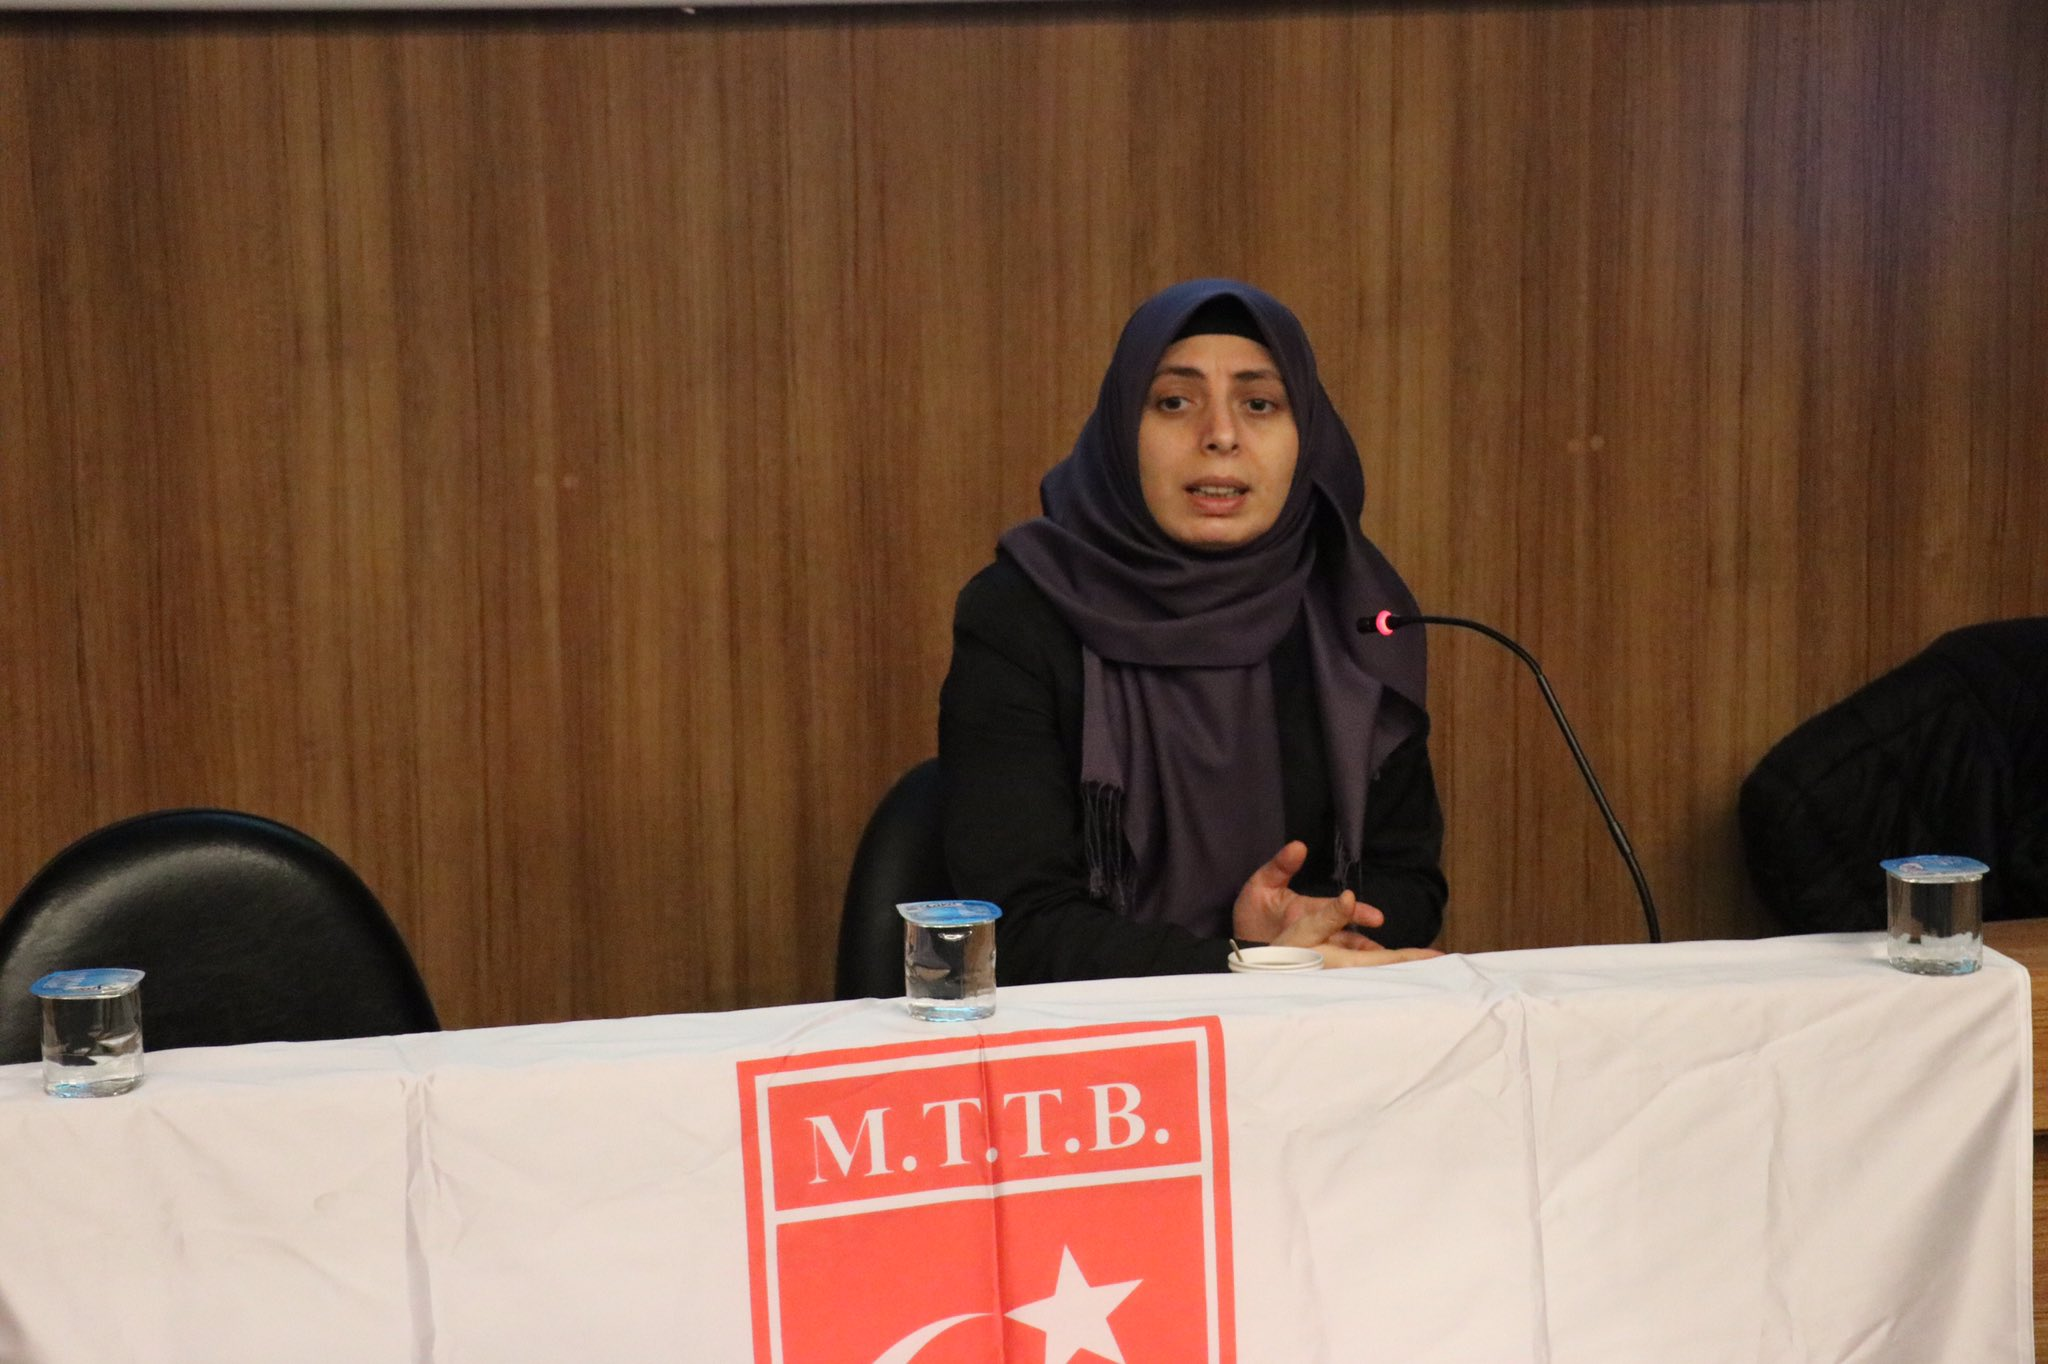 MTTB Üniversite Teşkilatı